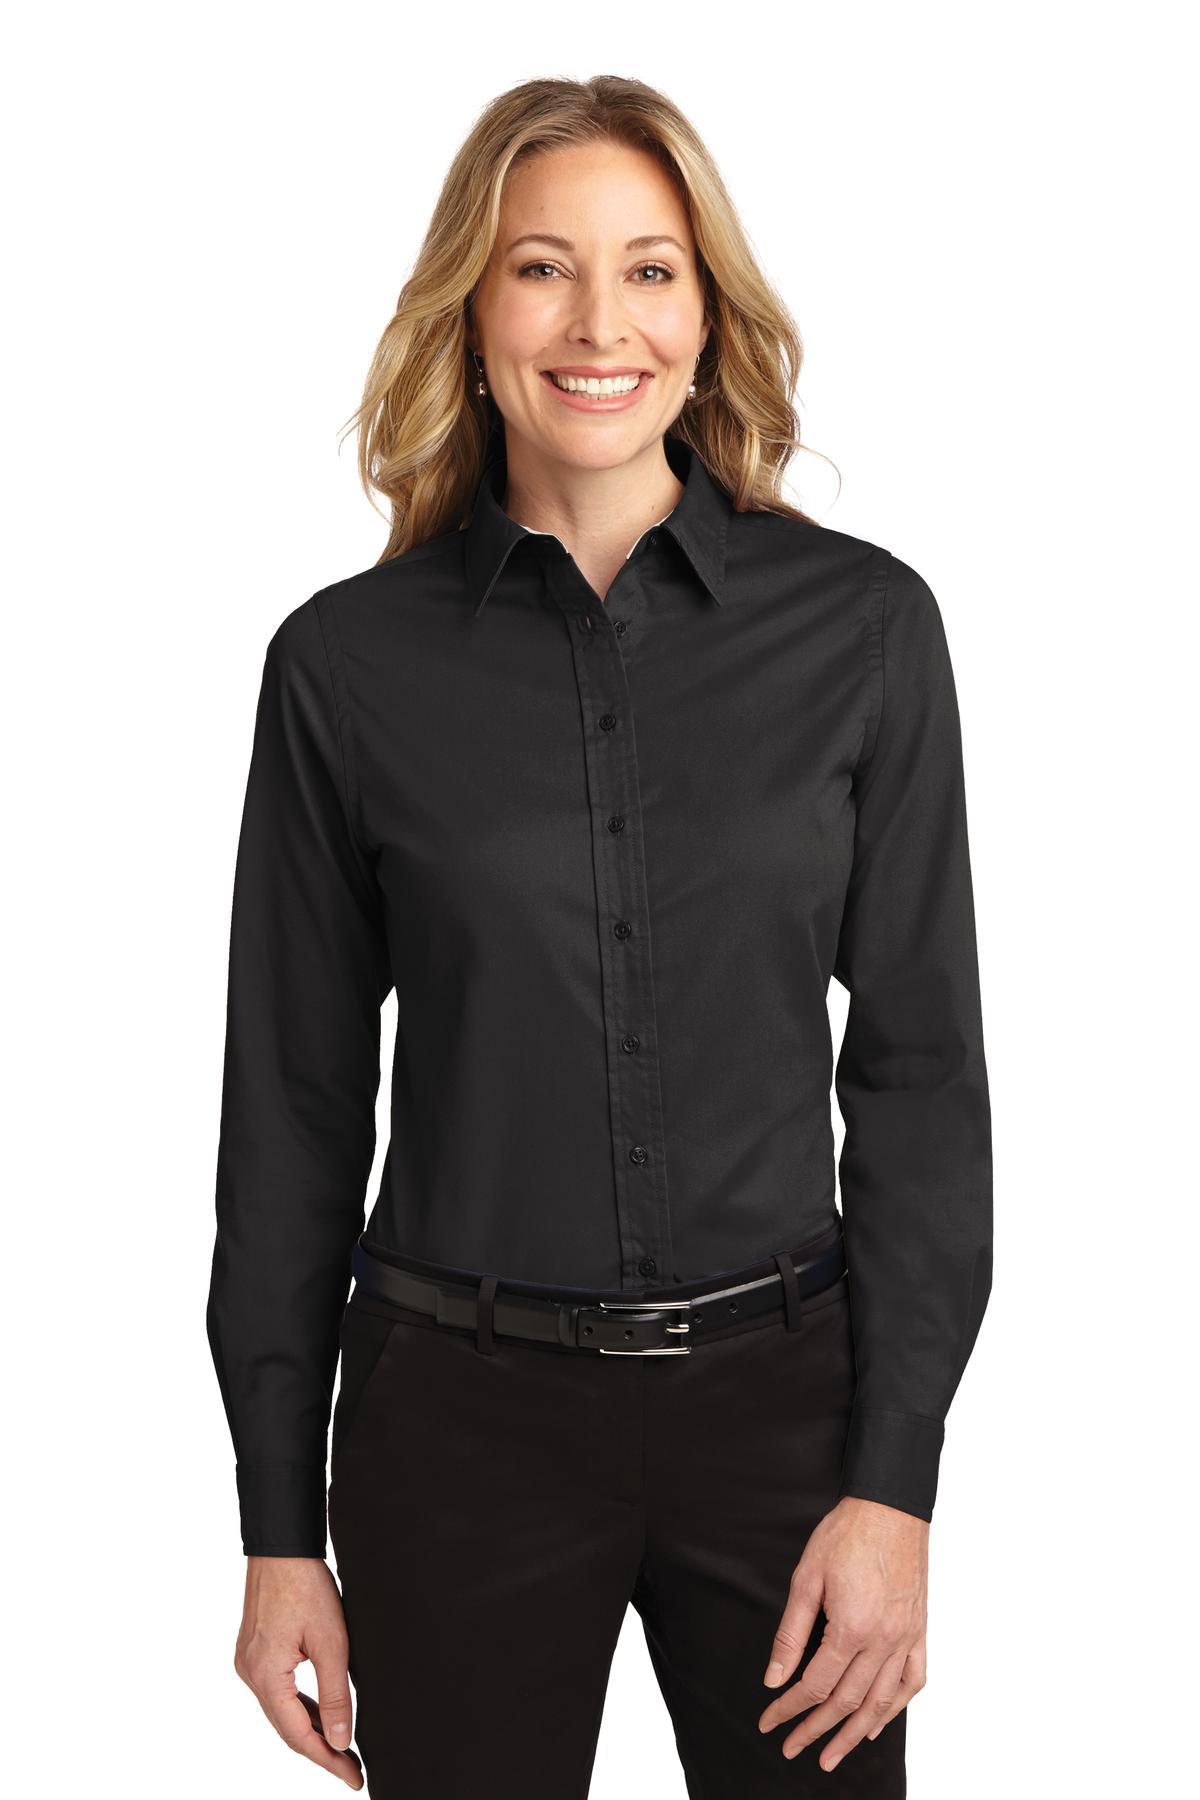 Port Authority® Ladies Long Sleeve Easy Care Shirt.-Port Authority